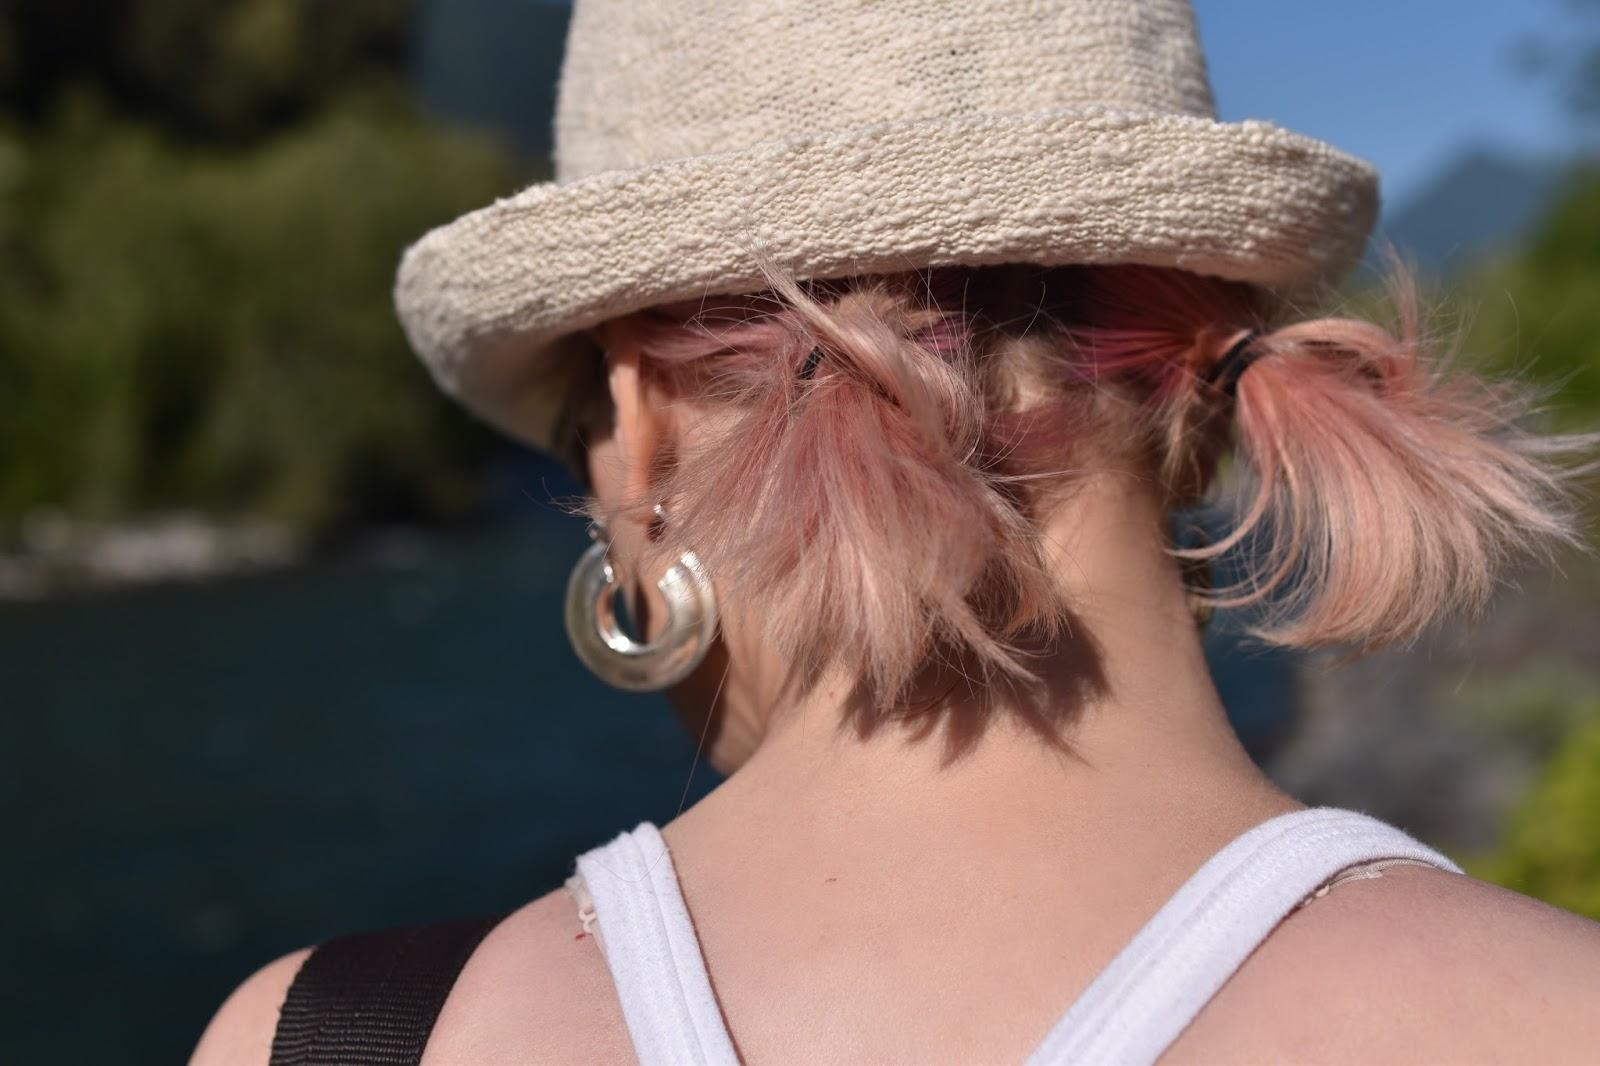 Monika Faulkner personal style inspiration - straw fedora, pink hair